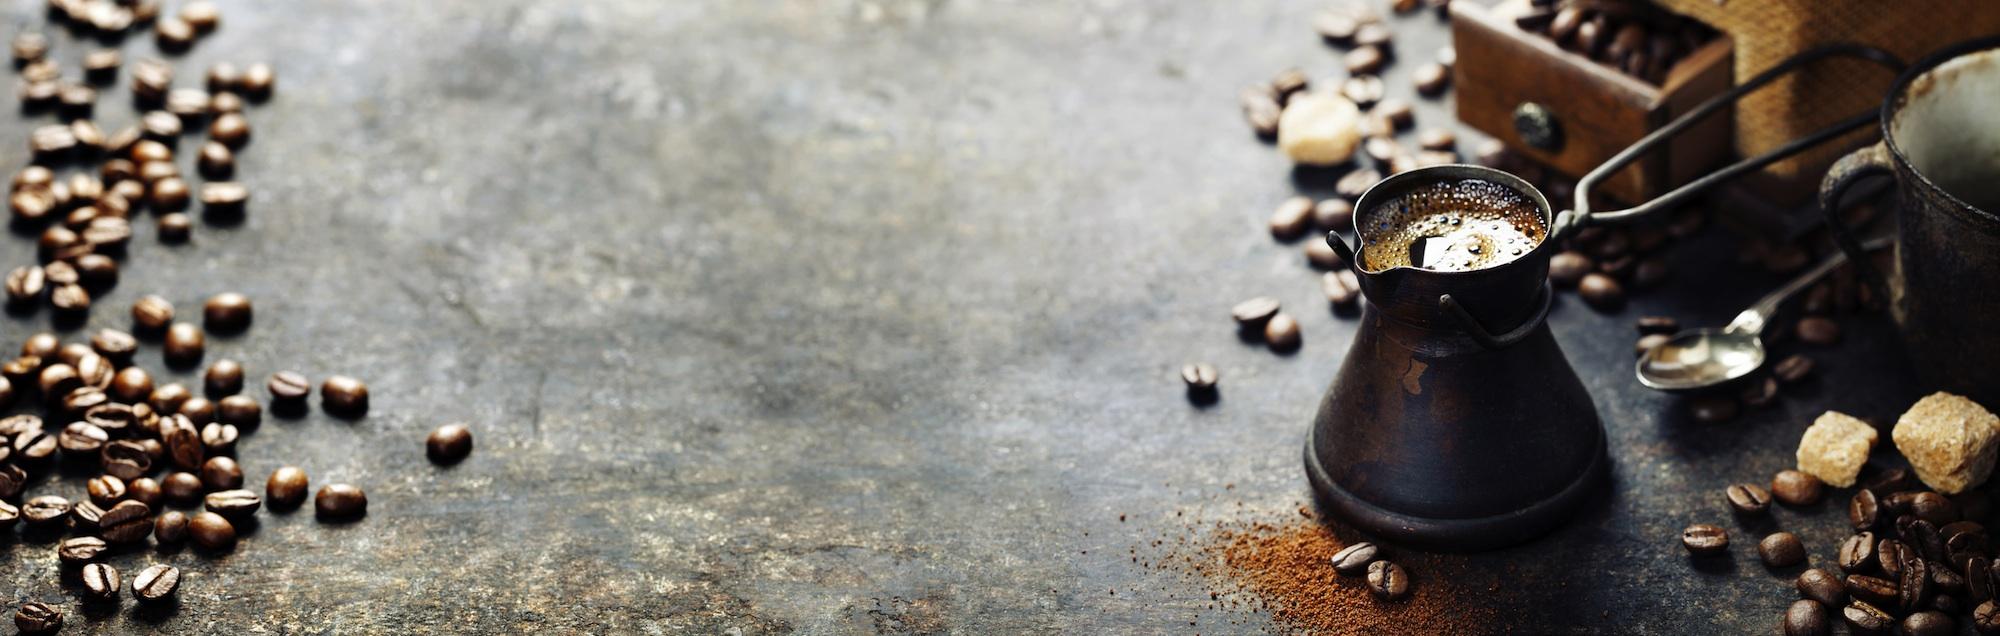 kaffeewagen hannover mobile kaffeebar unser kaffee